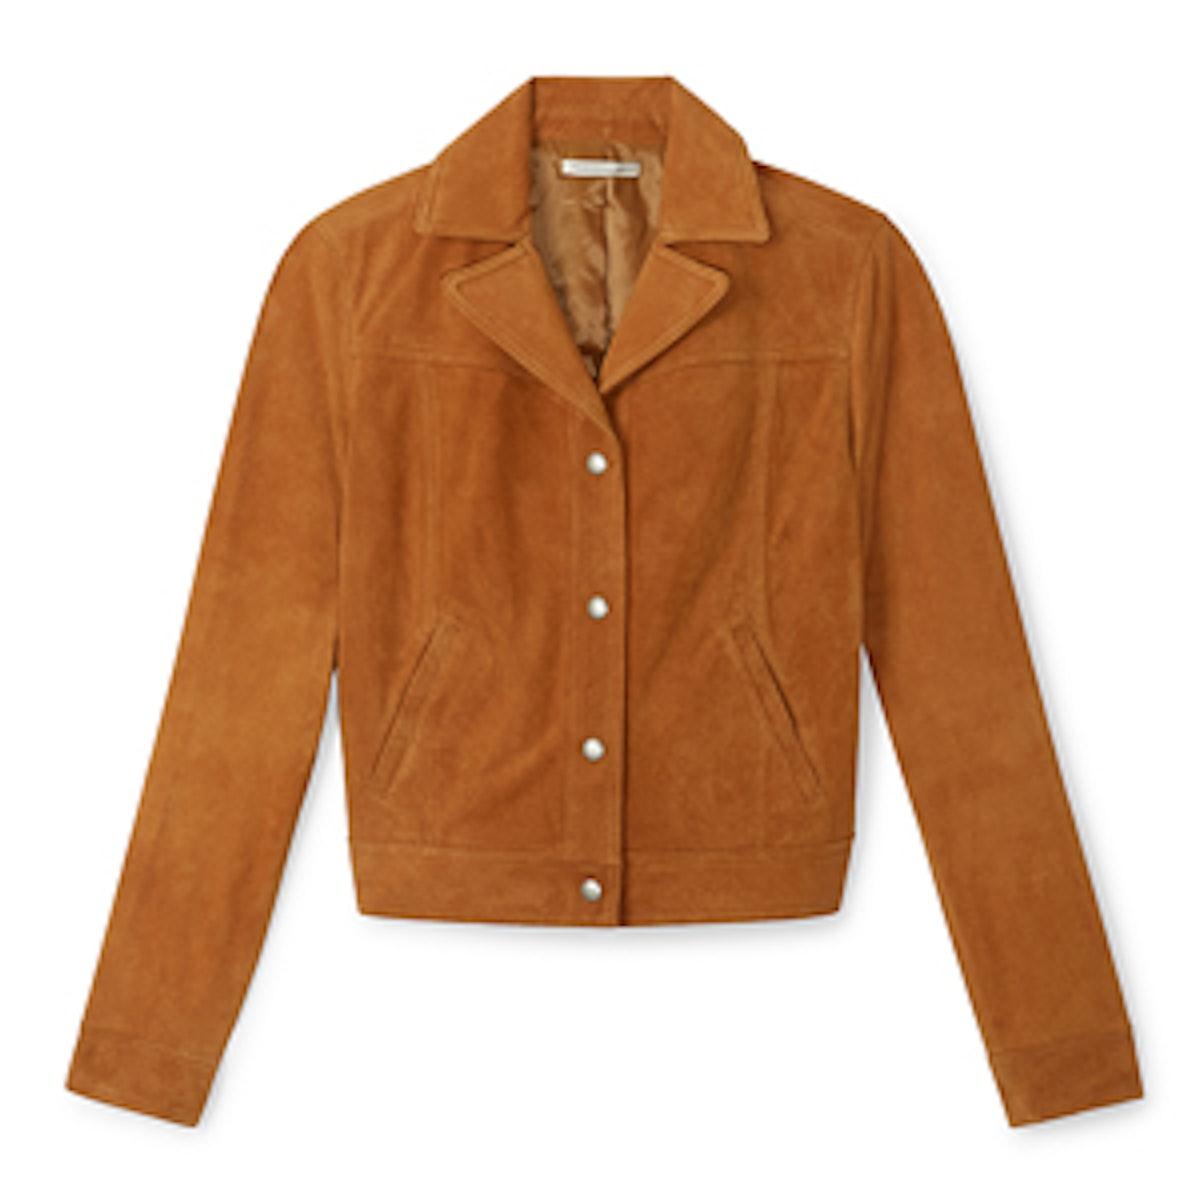 Gide Jacket